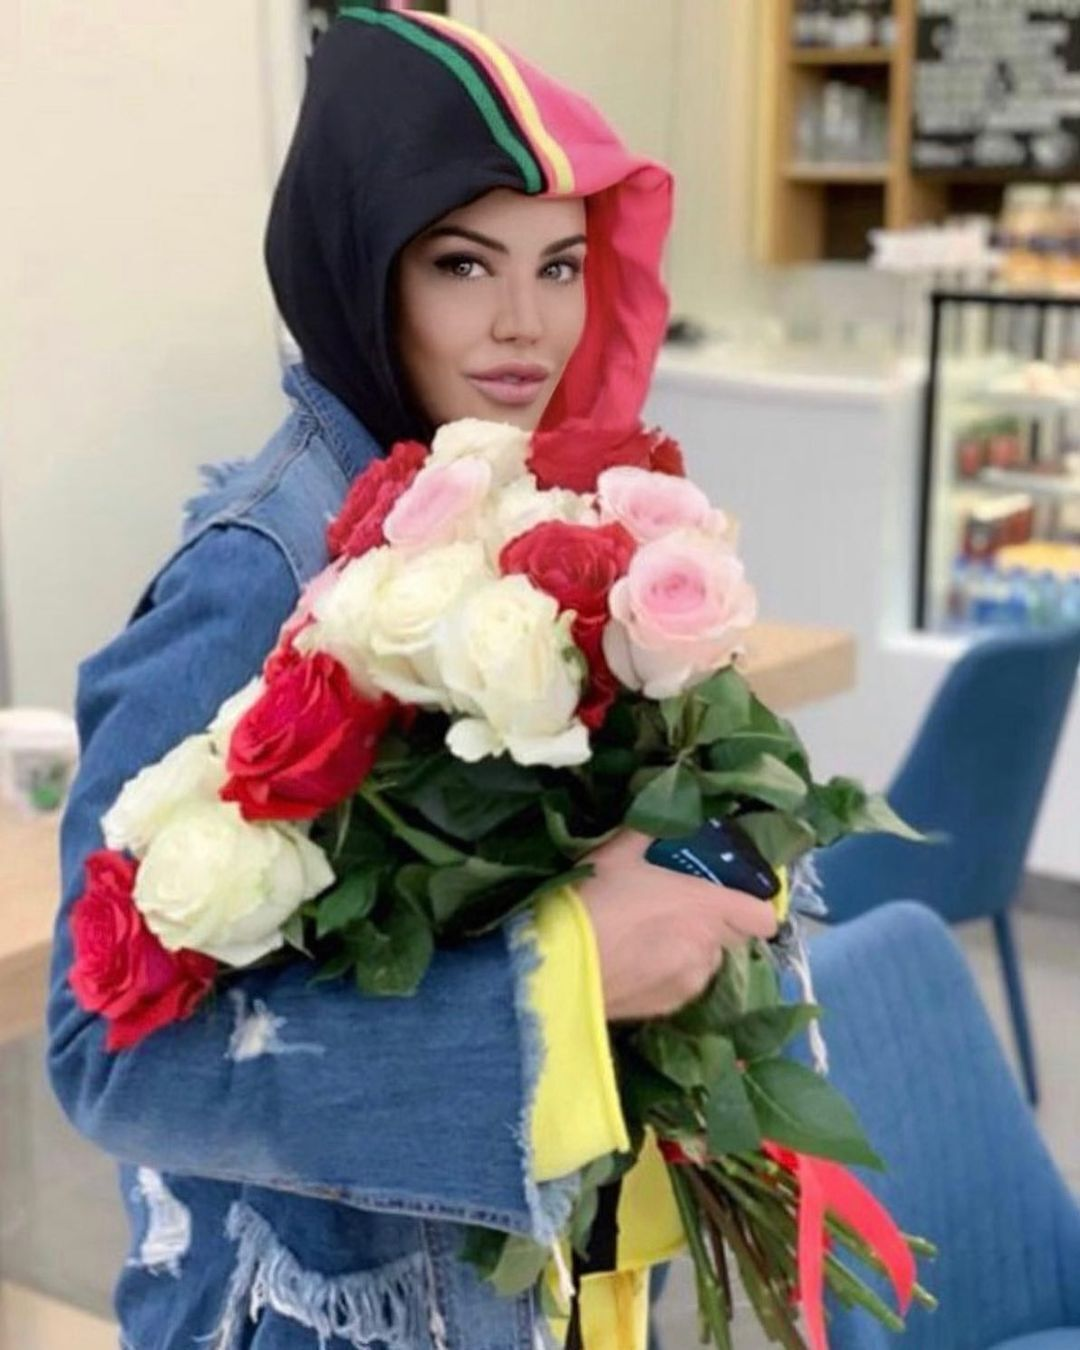 Оксана Байрак с цветами.